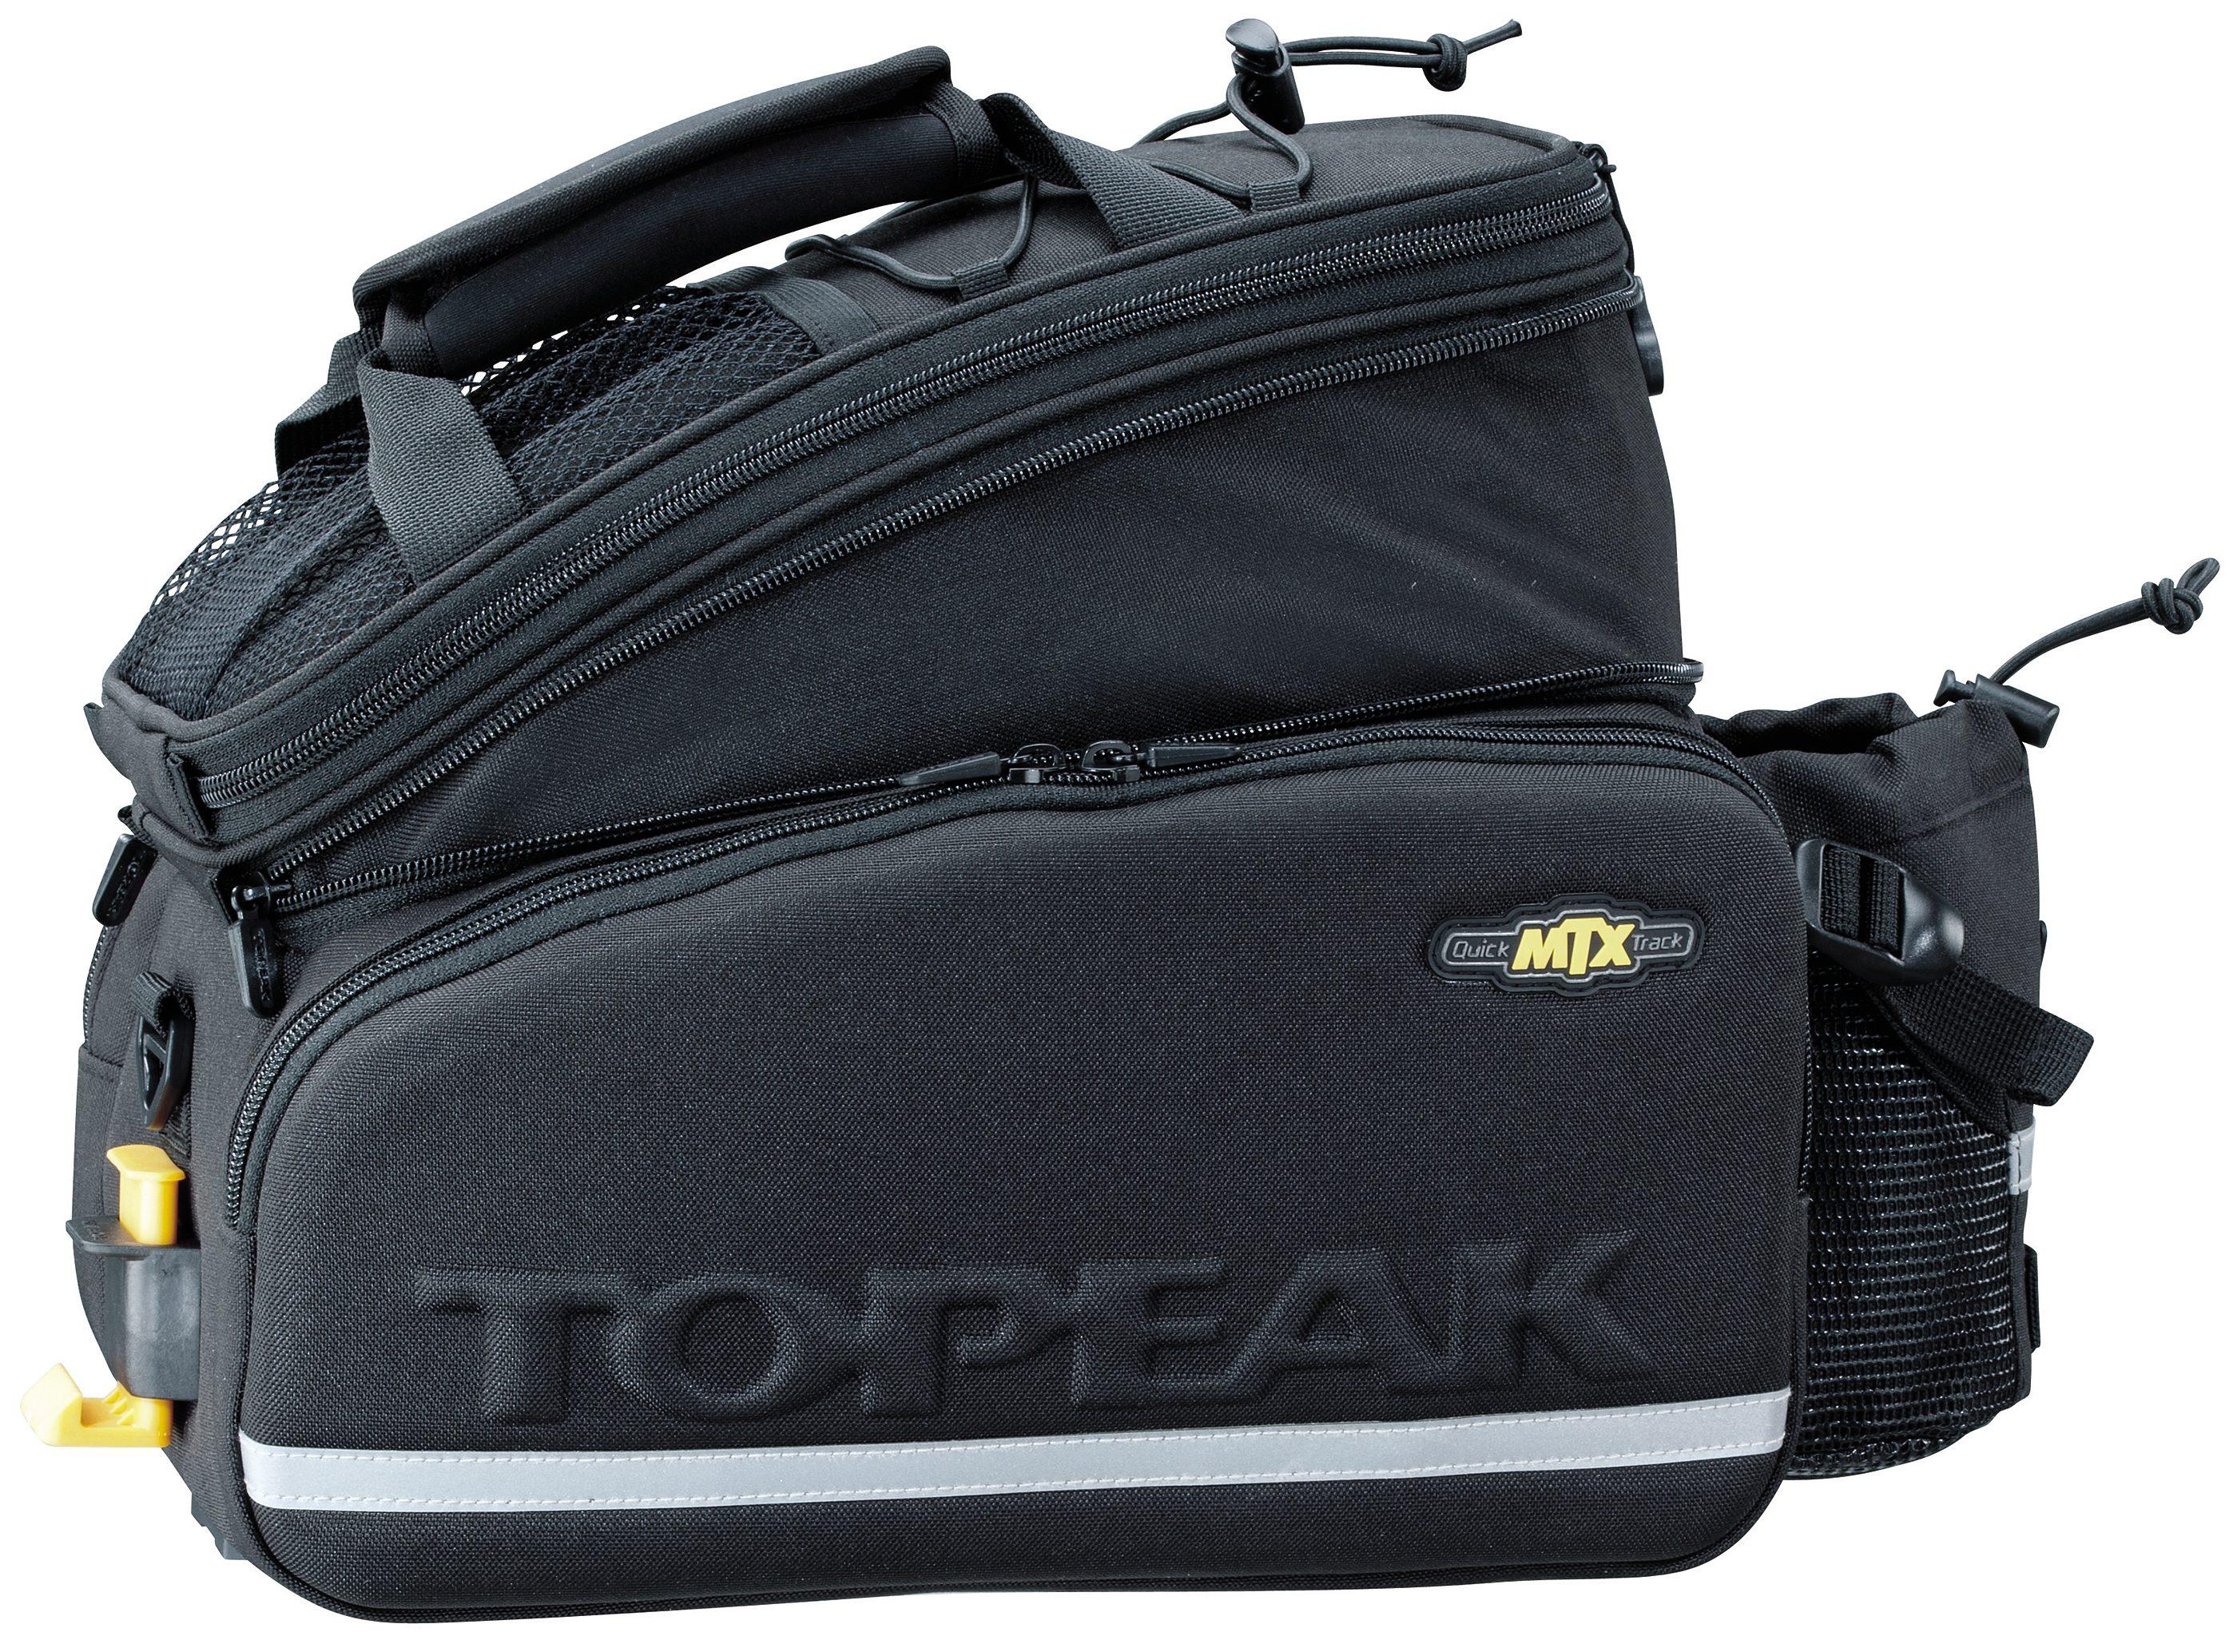 Topeak Gepäckträgertasche »MTX Trunk Bag DX Gepäckträgertasche«